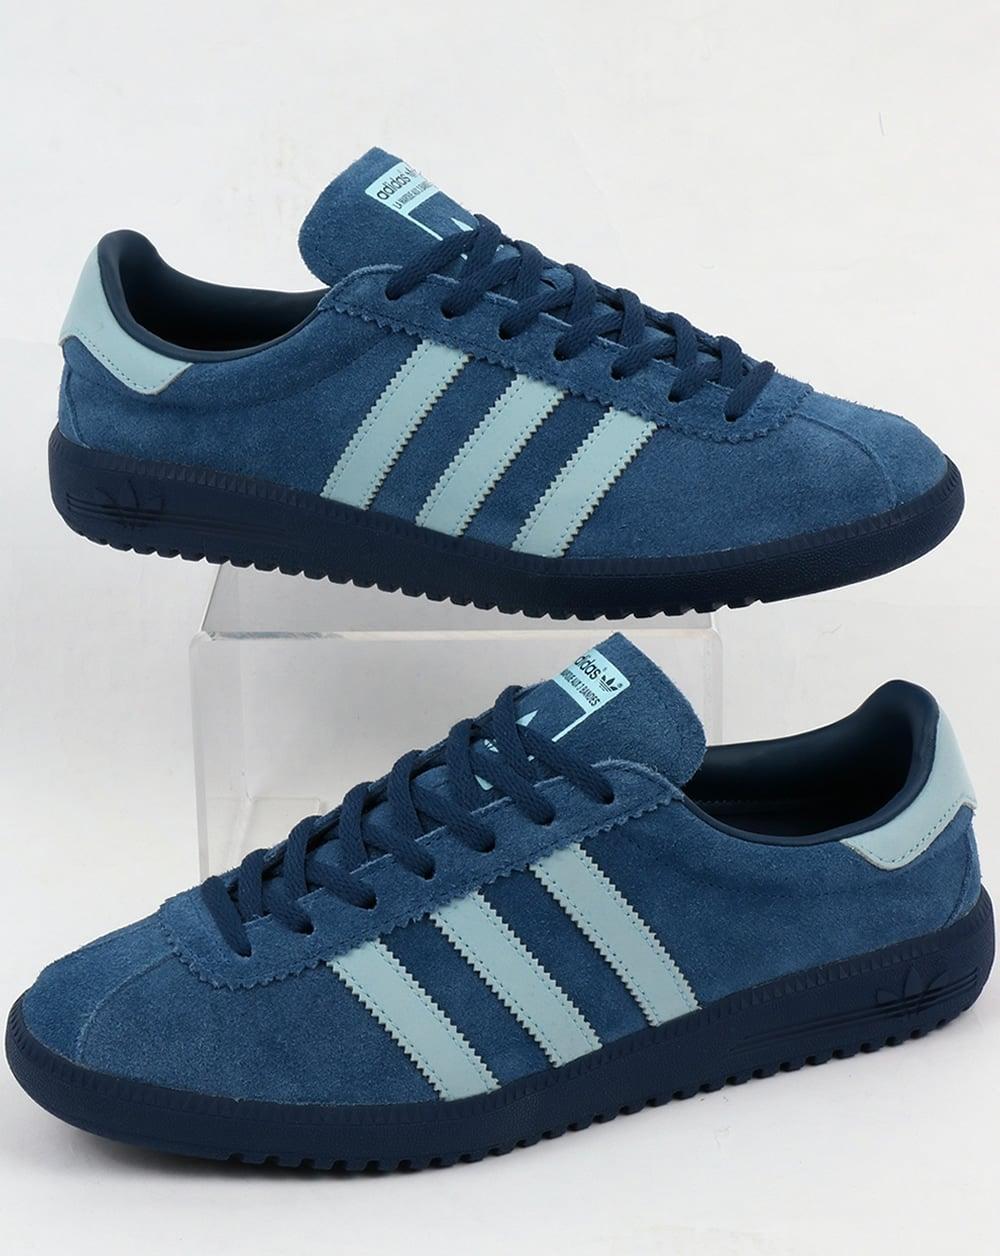 Adidas Bermuda Trainers Vintage NavySky Blue